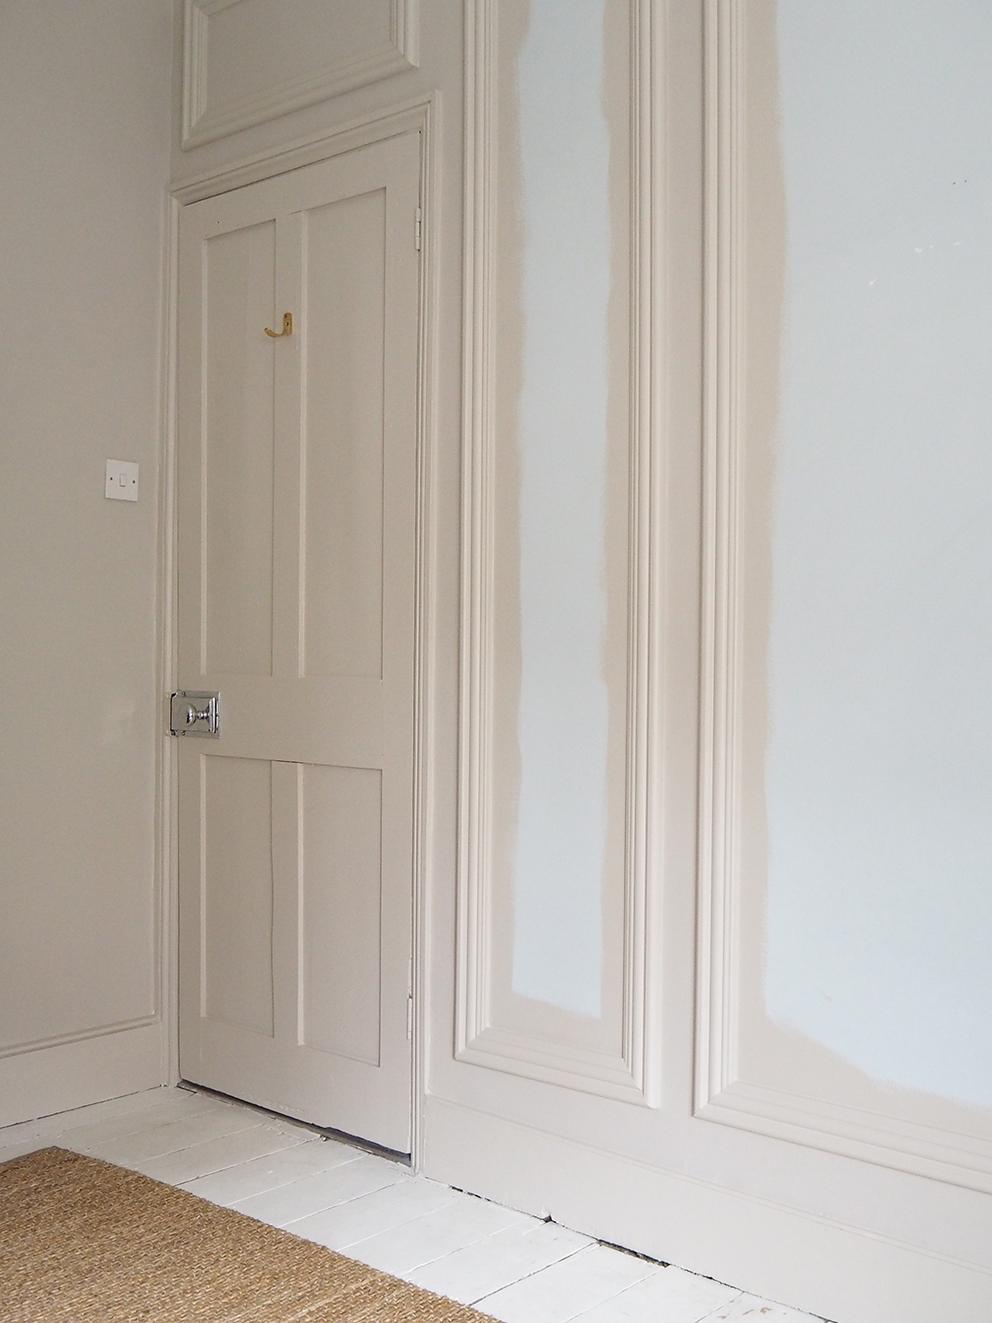 August 2017 F R E N C H O P I A L Wooden Framed Doors Over Fuse Box Mouldingawaitingwallpaper2